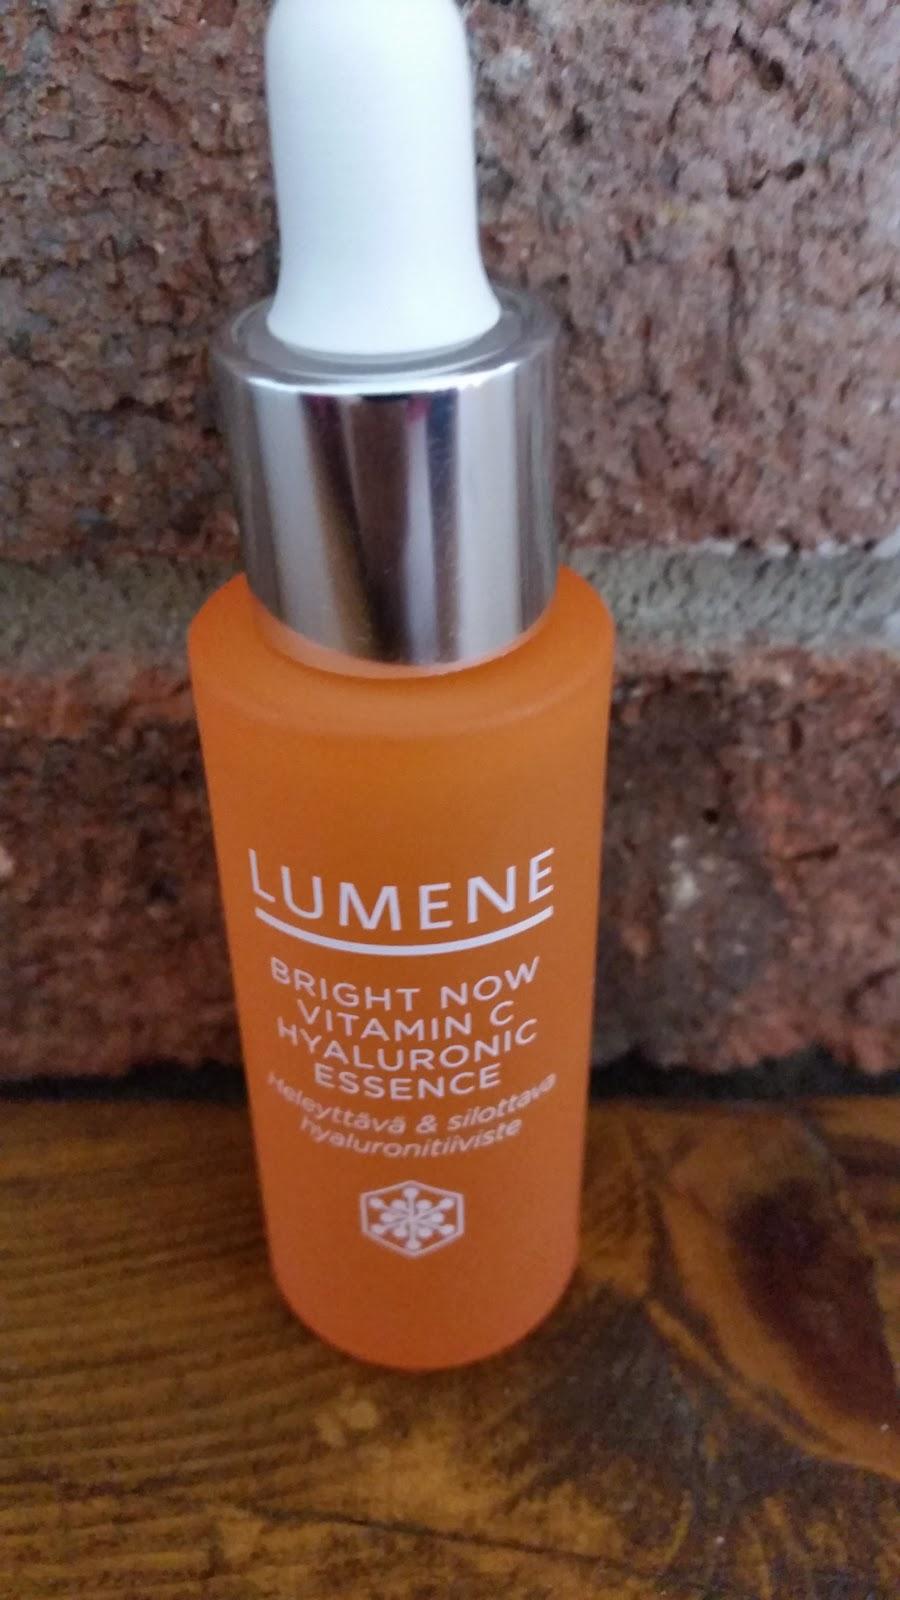 lumene bright now vitamin c hyaluronic essence